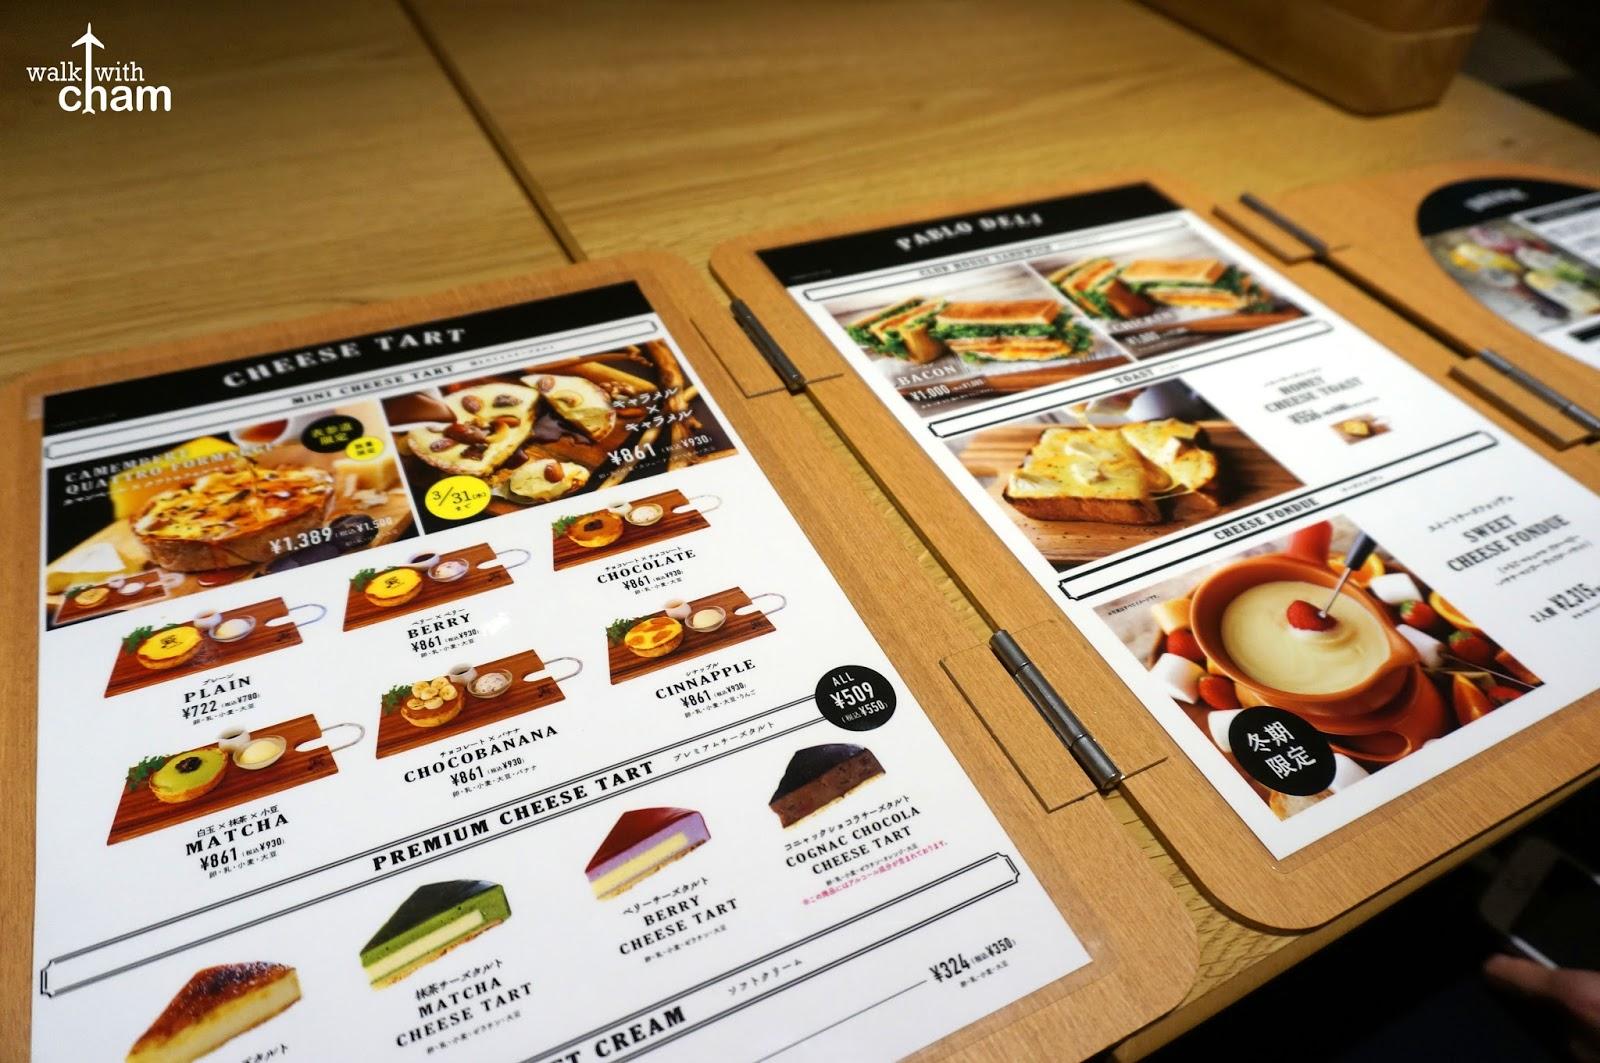 Pablo Cheesecake Price Ide Dimage De Gteau Sabrel Cheese Walk With Cham Harajuku Tokyo Japan